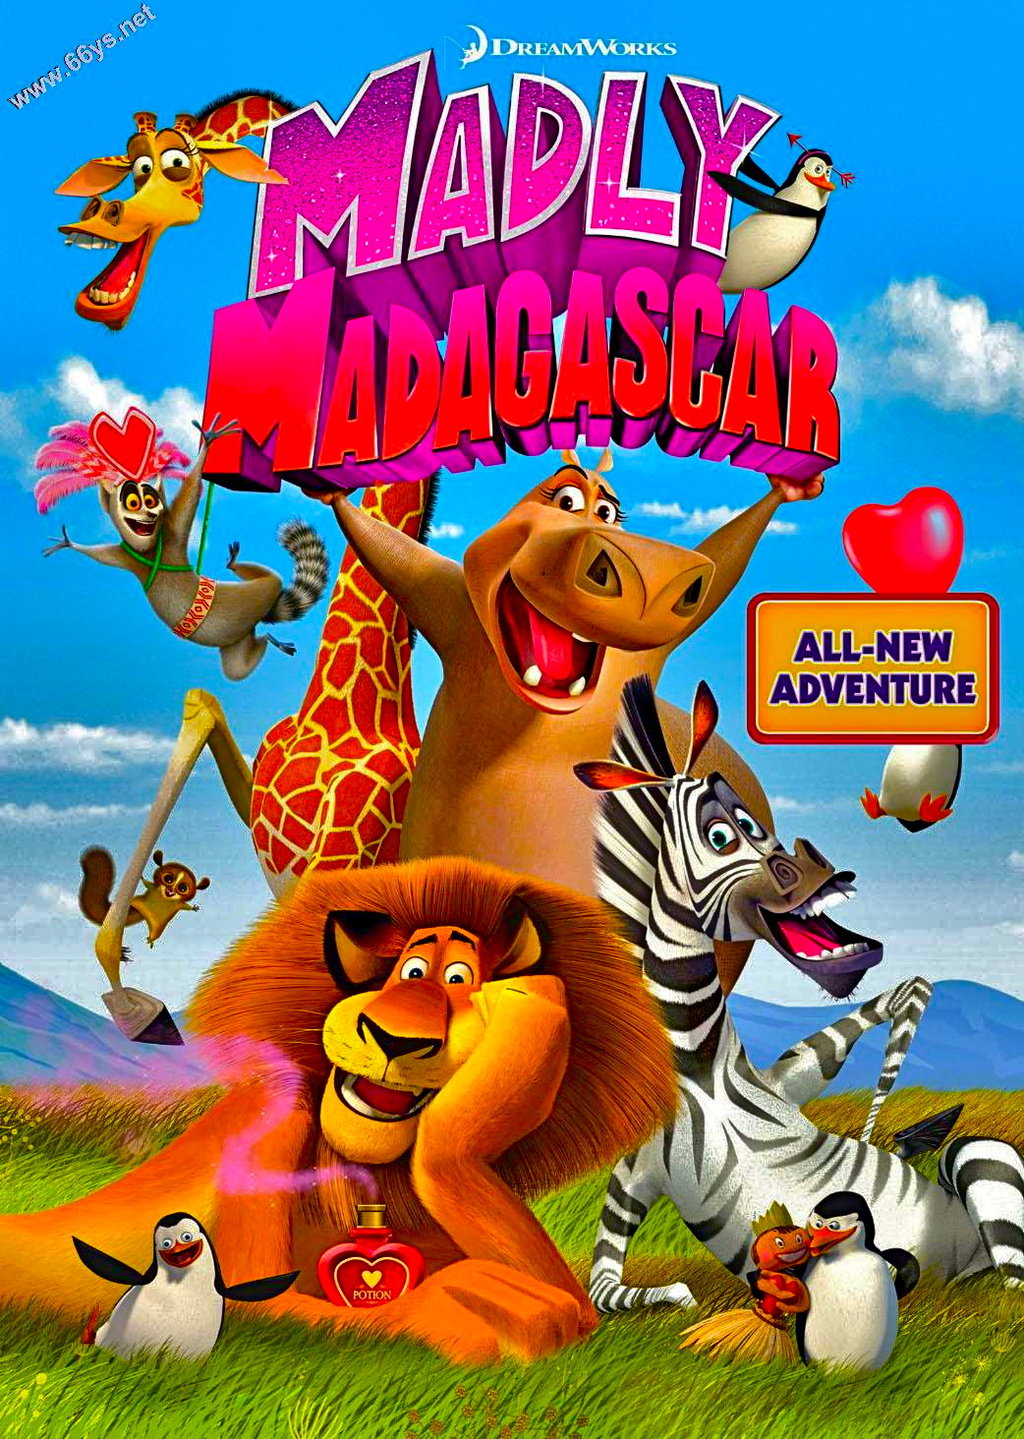 wallpaper madagascar film movies - photo #23